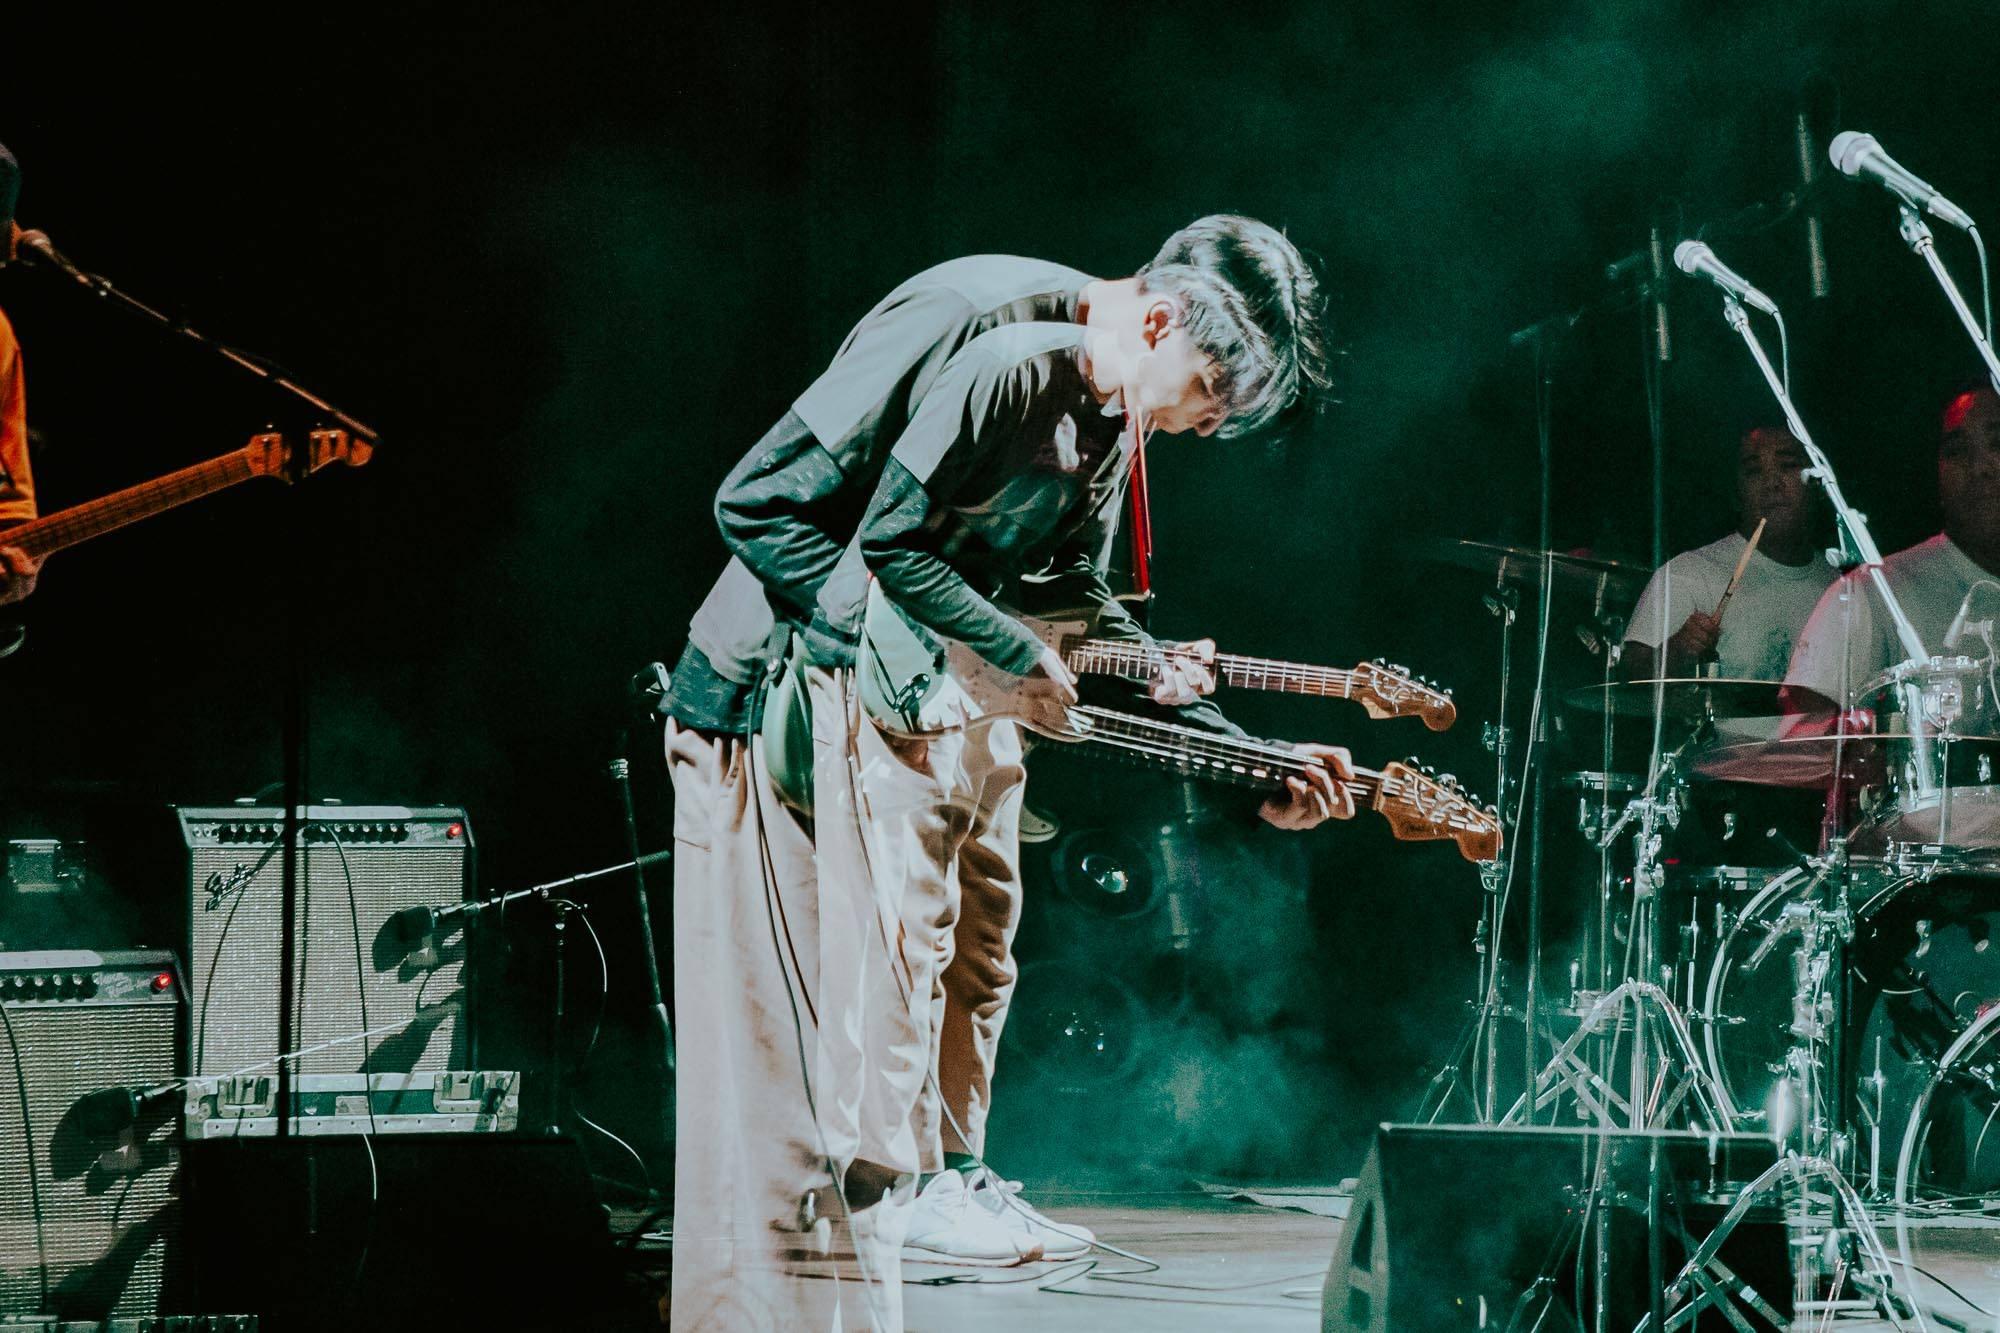 Phum Viphrit at Westward Festival, Vancouver, Sep 13 2019. Kelli Anne photo.